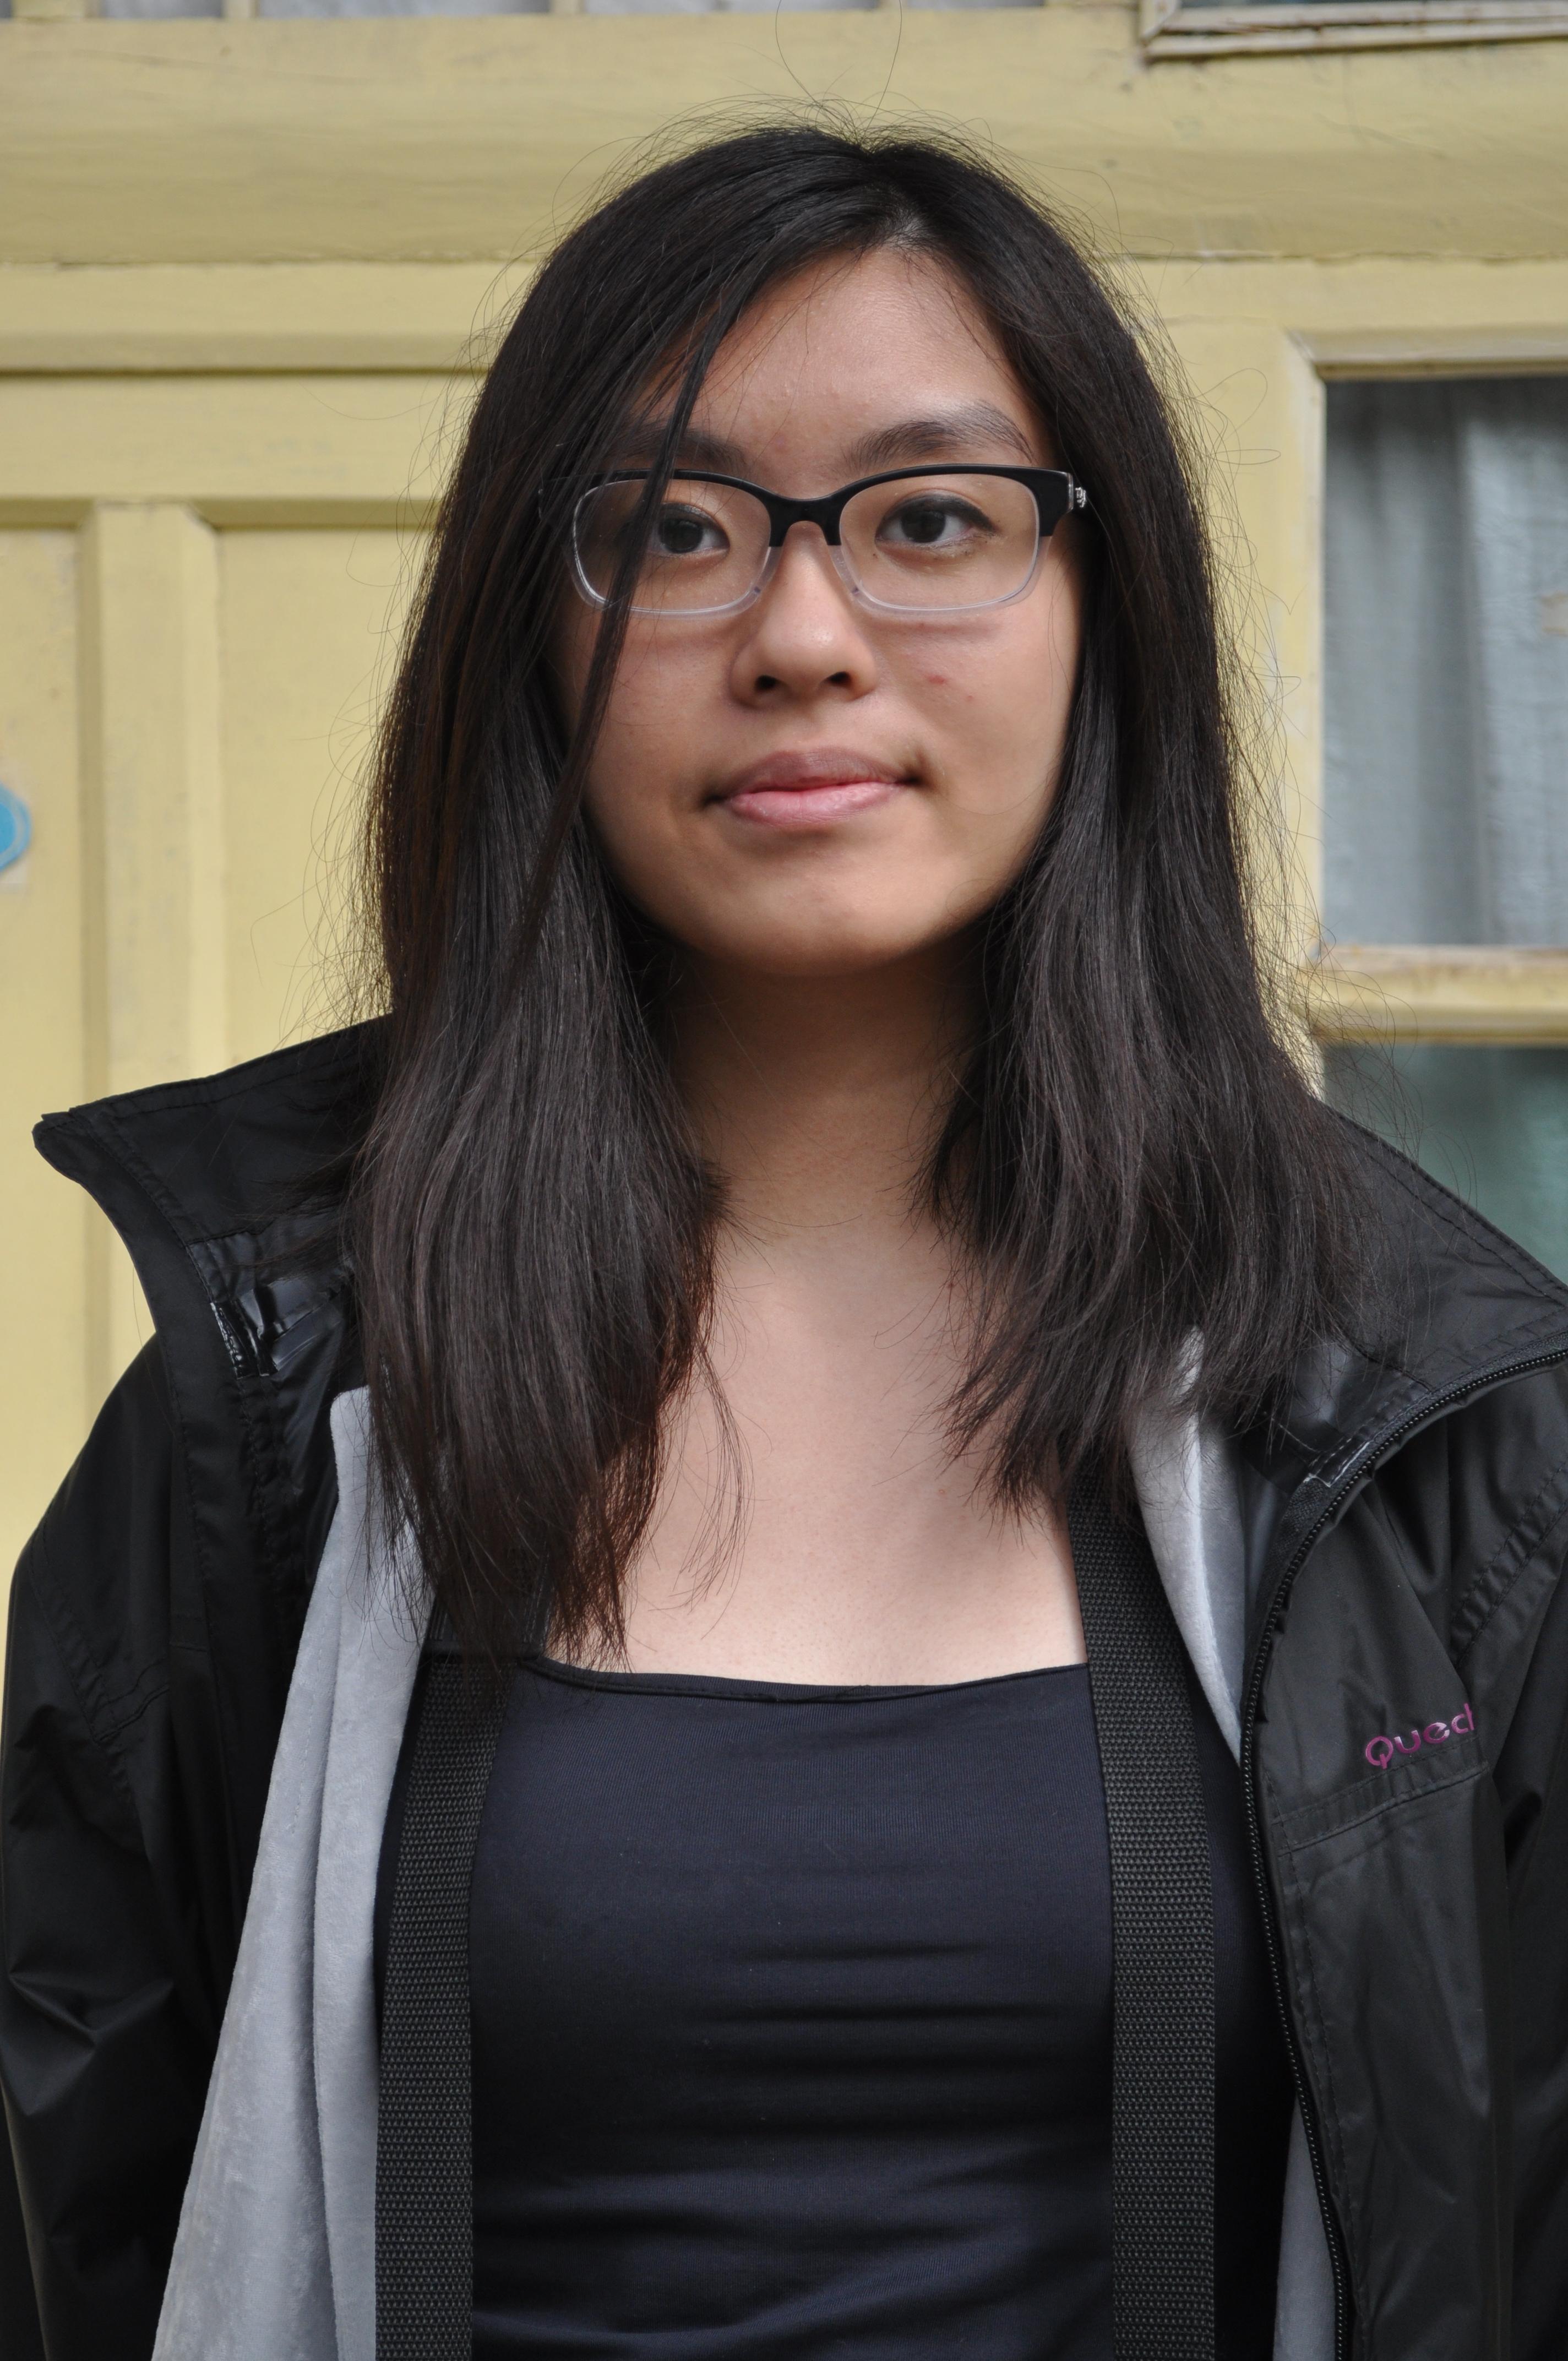 Li Na Daughter of Mao Zedong